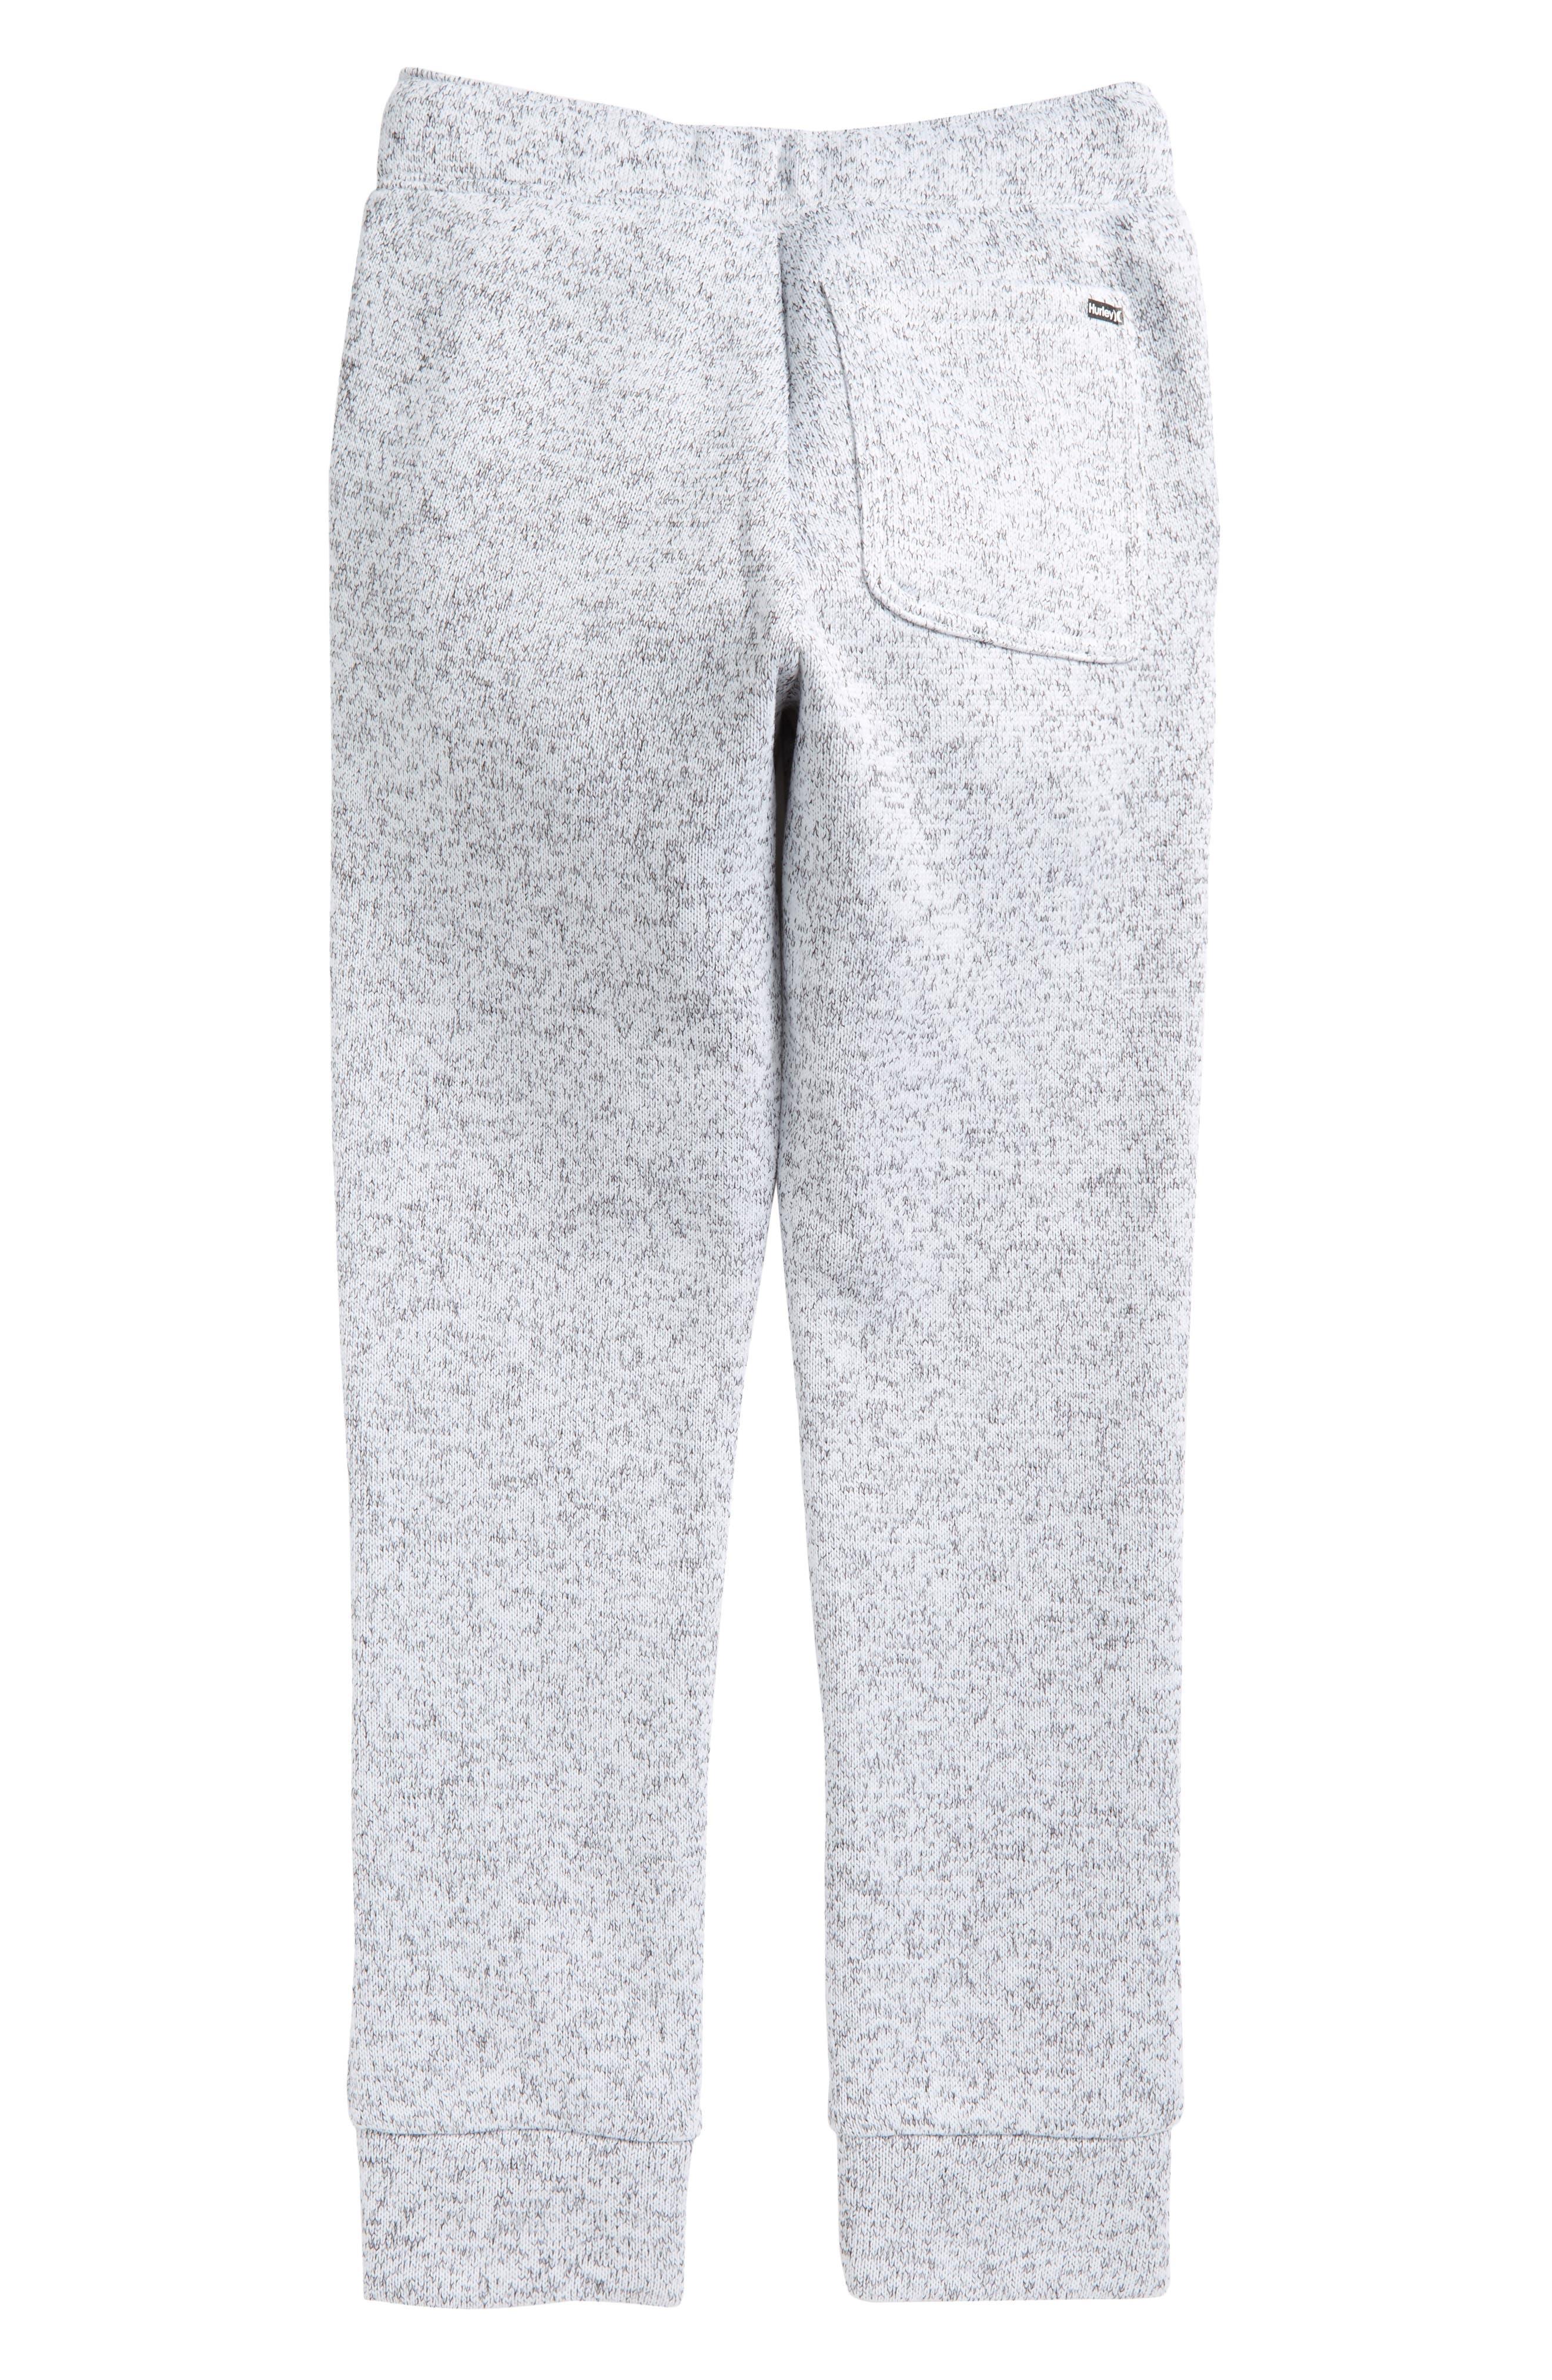 Sweater Knit Fleece Pants,                             Alternate thumbnail 2, color,                             White